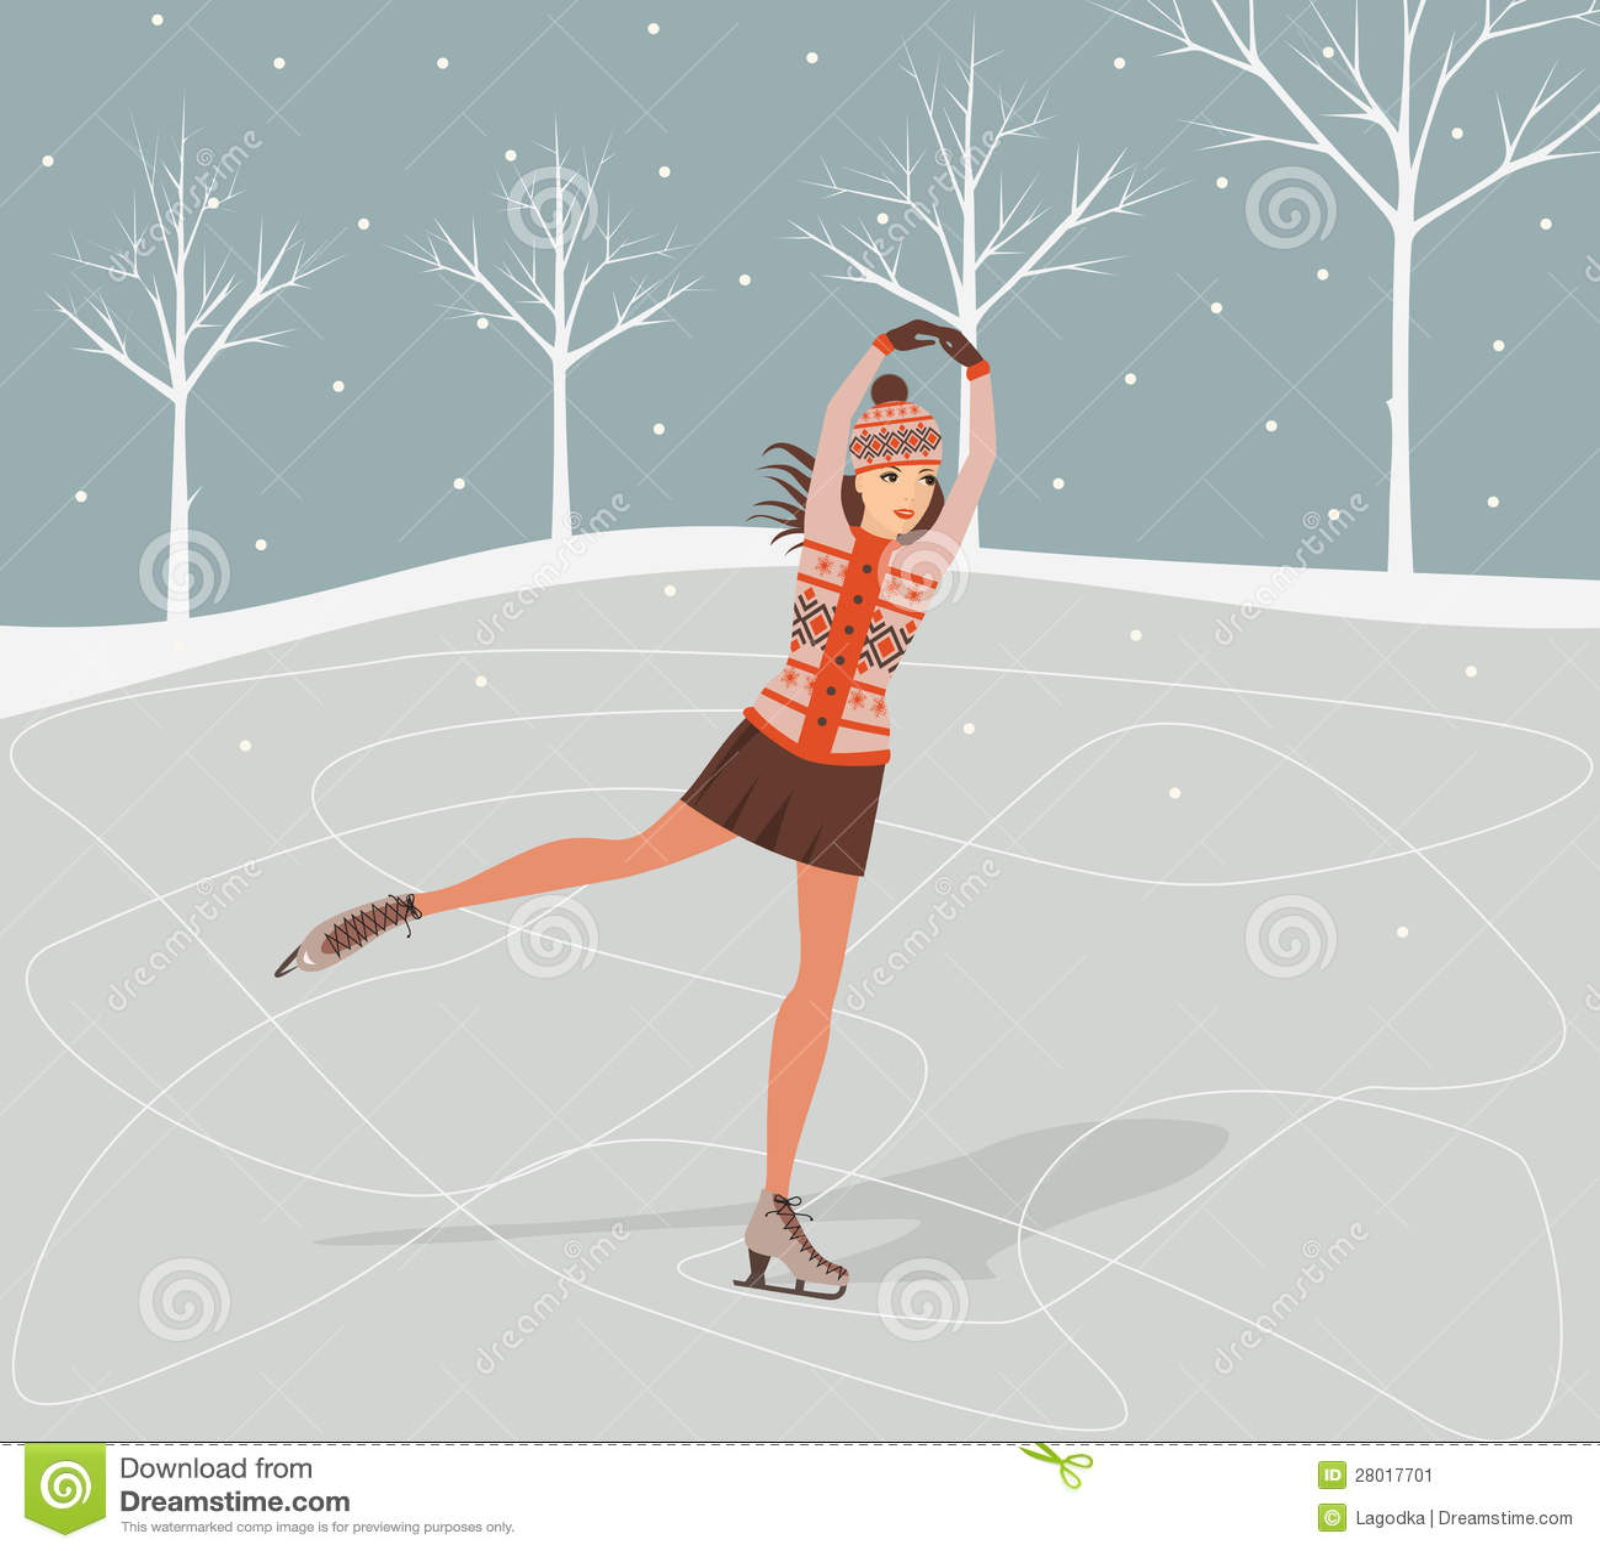 Картинки девушка на коньках